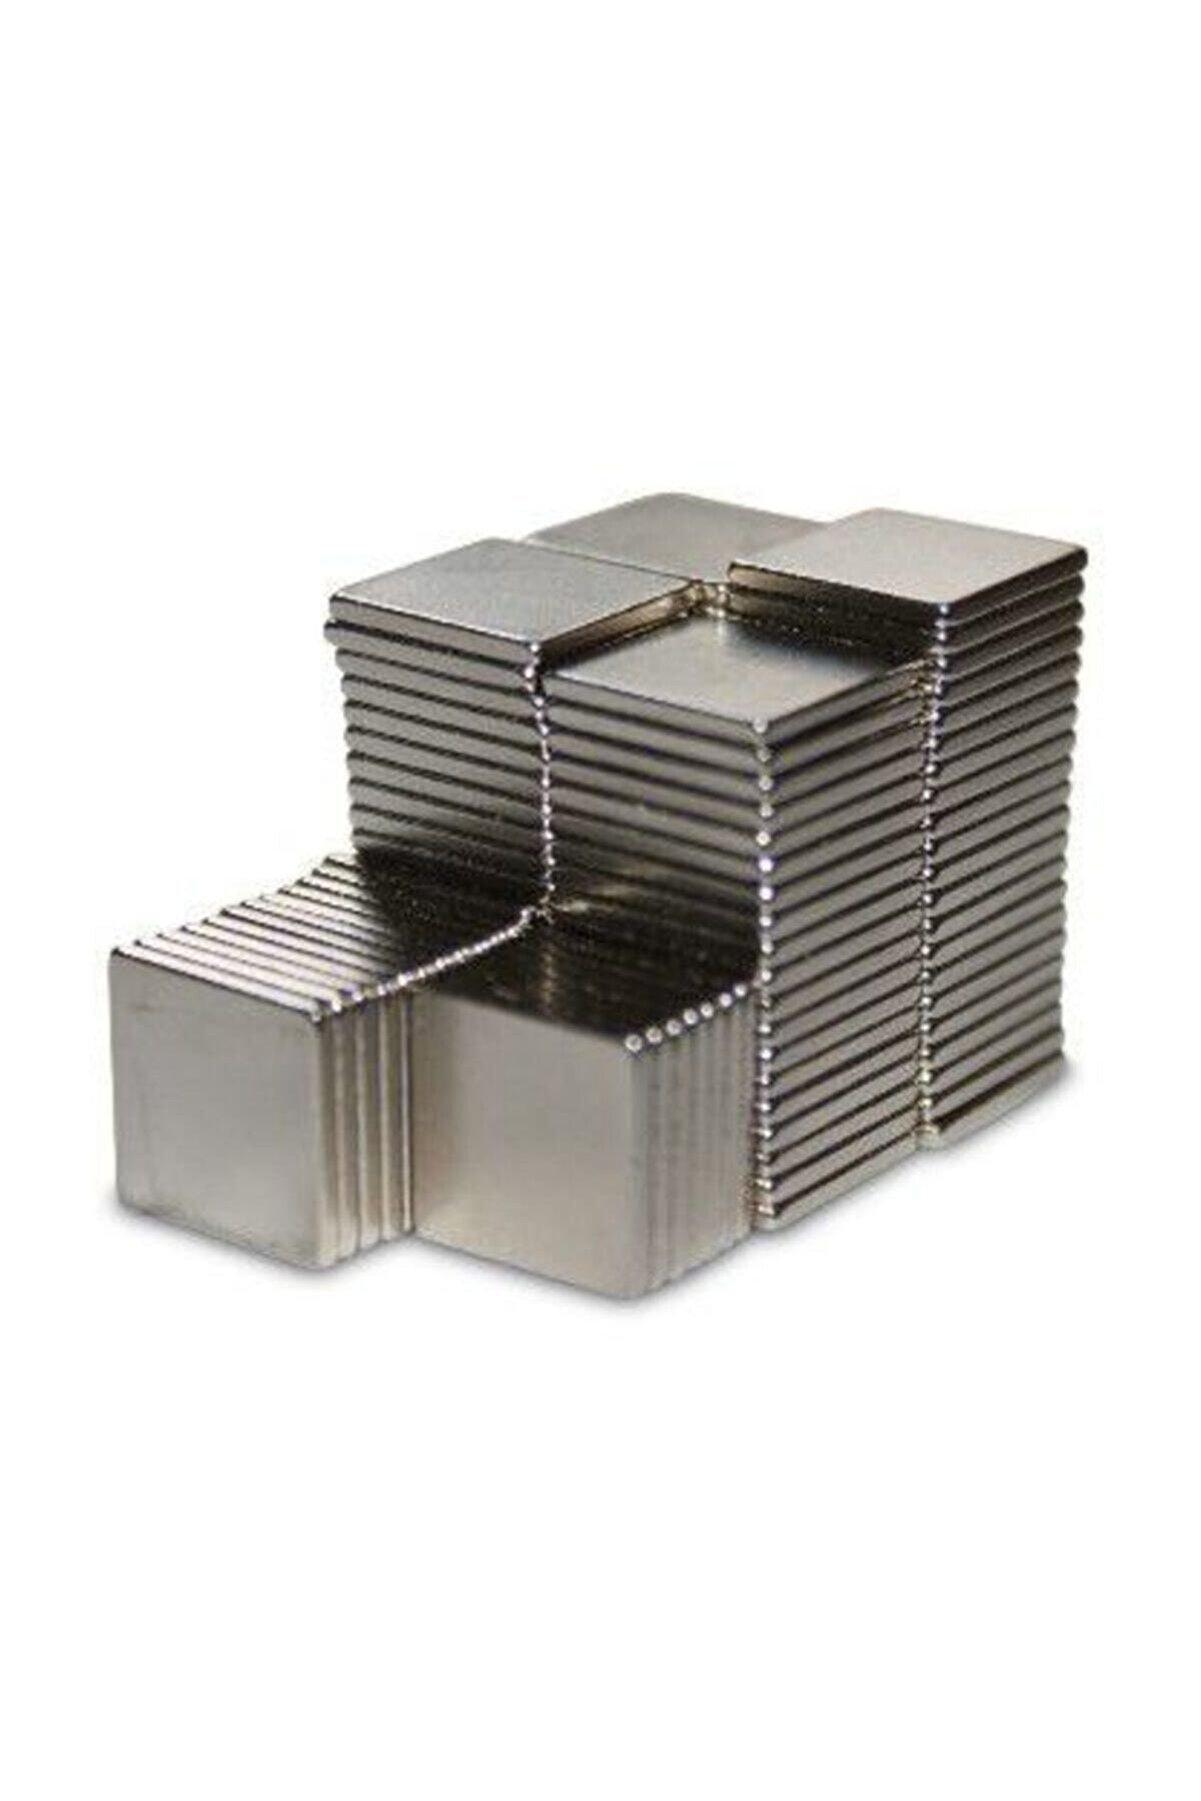 Dünya Magnet 50 Adet 10x10x1 Süper Güçlü Kare Neodyum Mıknatıs Magnet (50'li Paket)